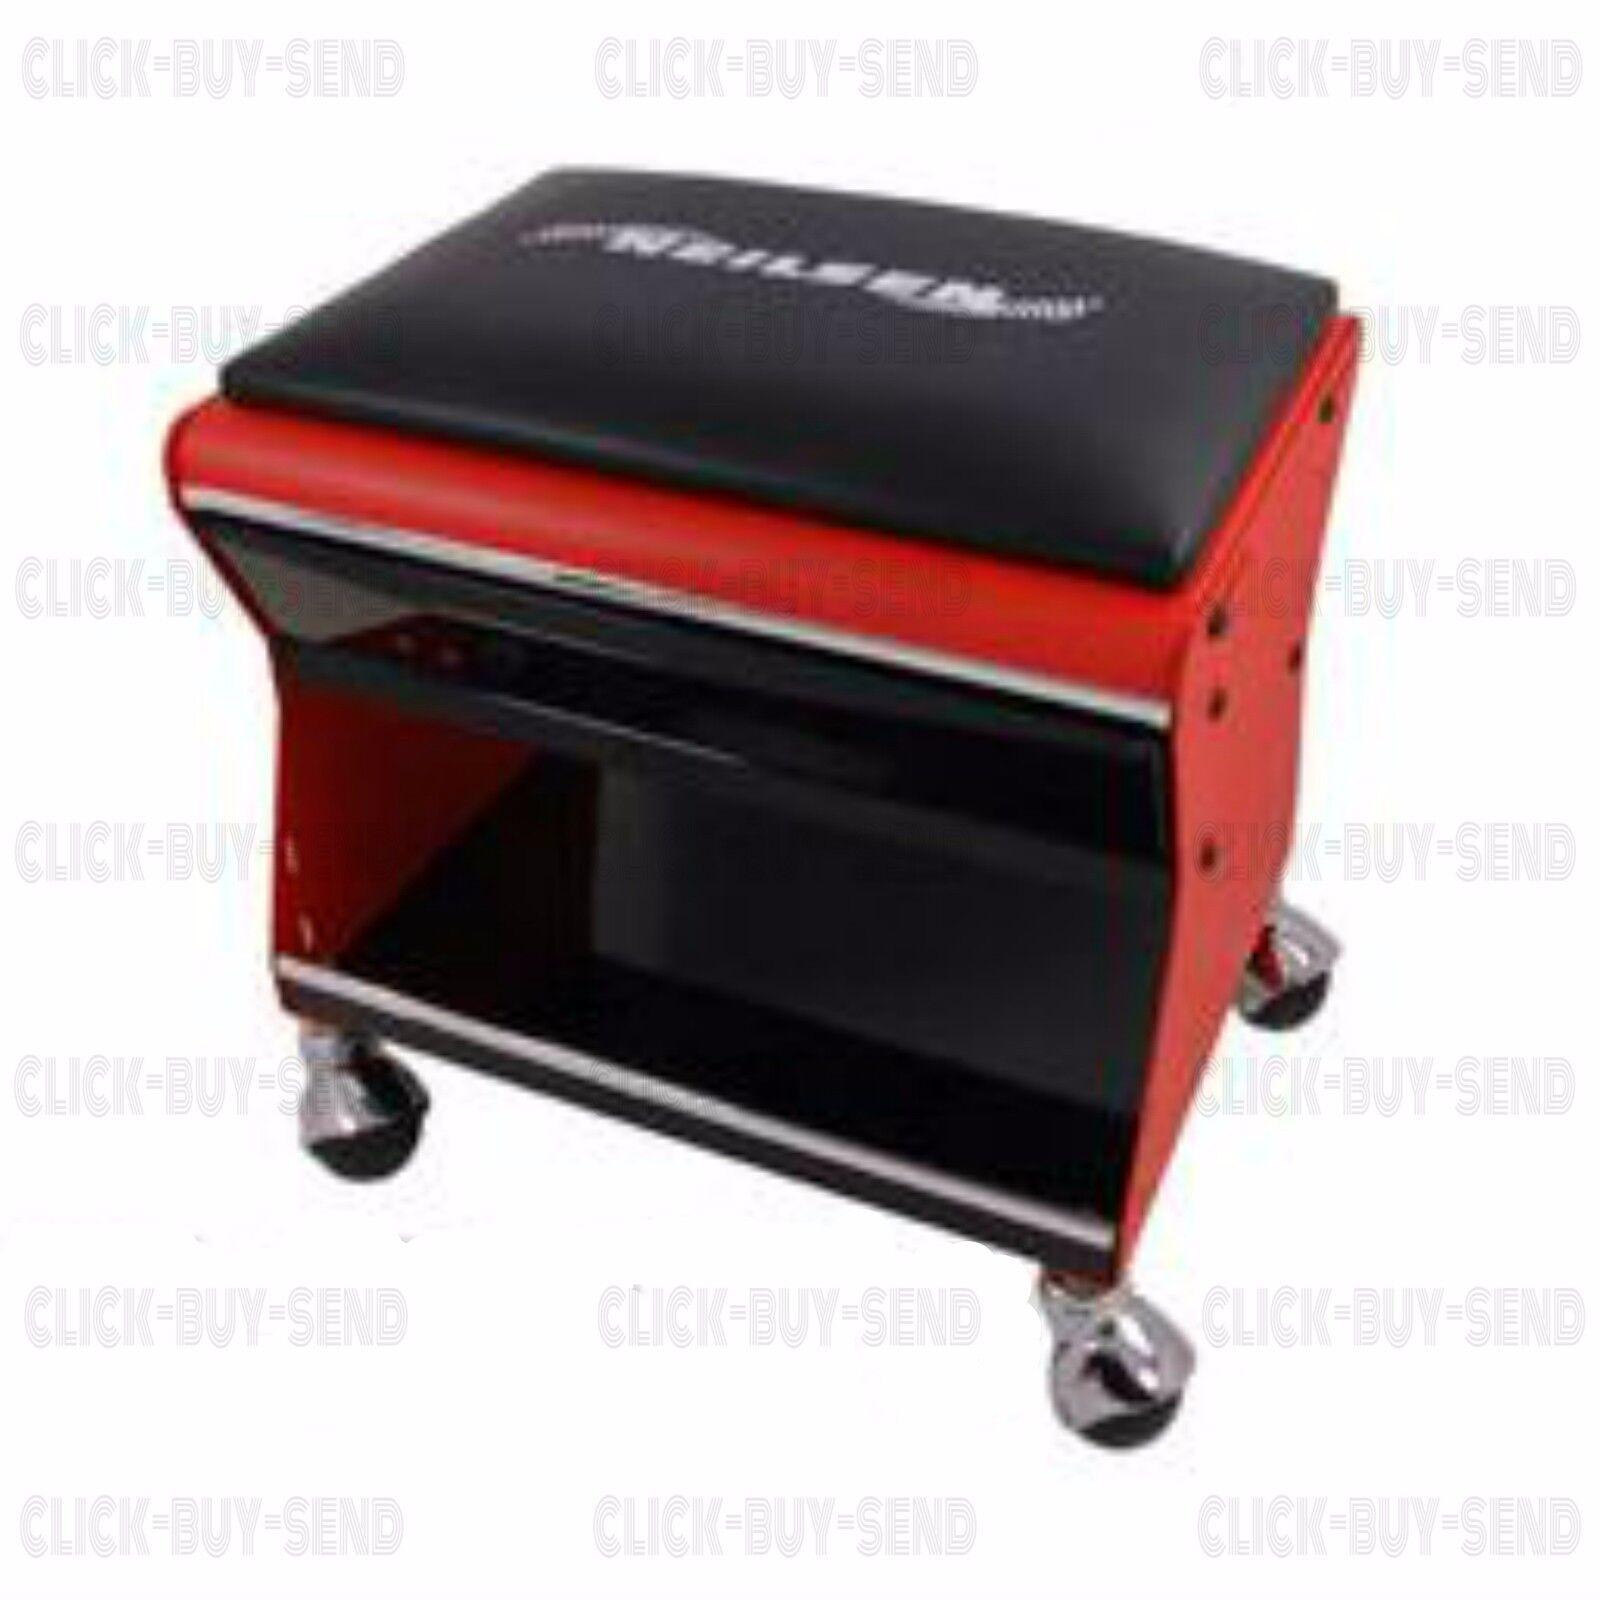 Creeper garage workshop mechanics mechanic trolley seat for Garage seat belgique